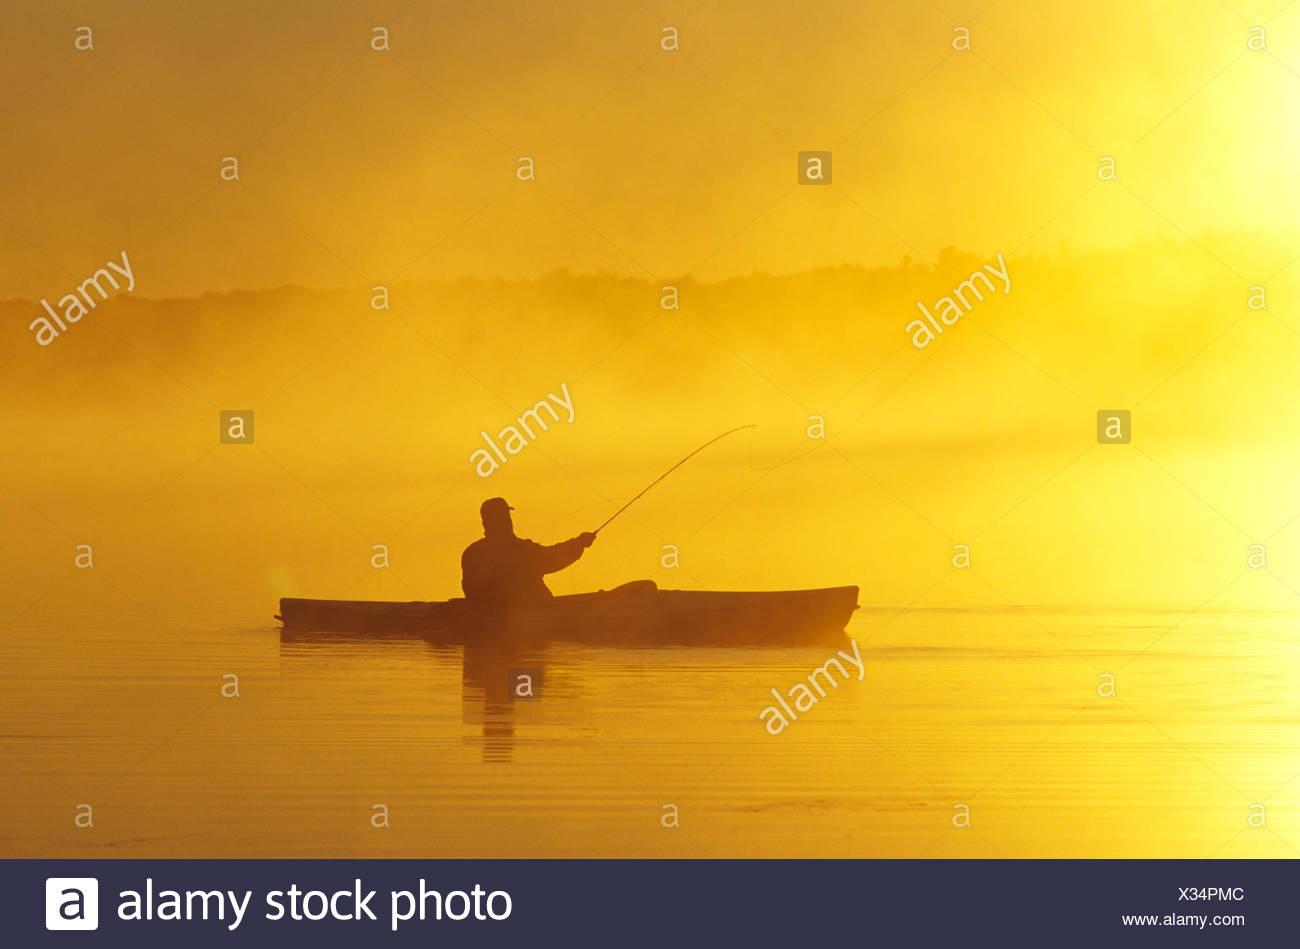 Middle-aged man fly fishing from sea kayak, Lake Muskoka, Ontario, Canada. - Stock Image